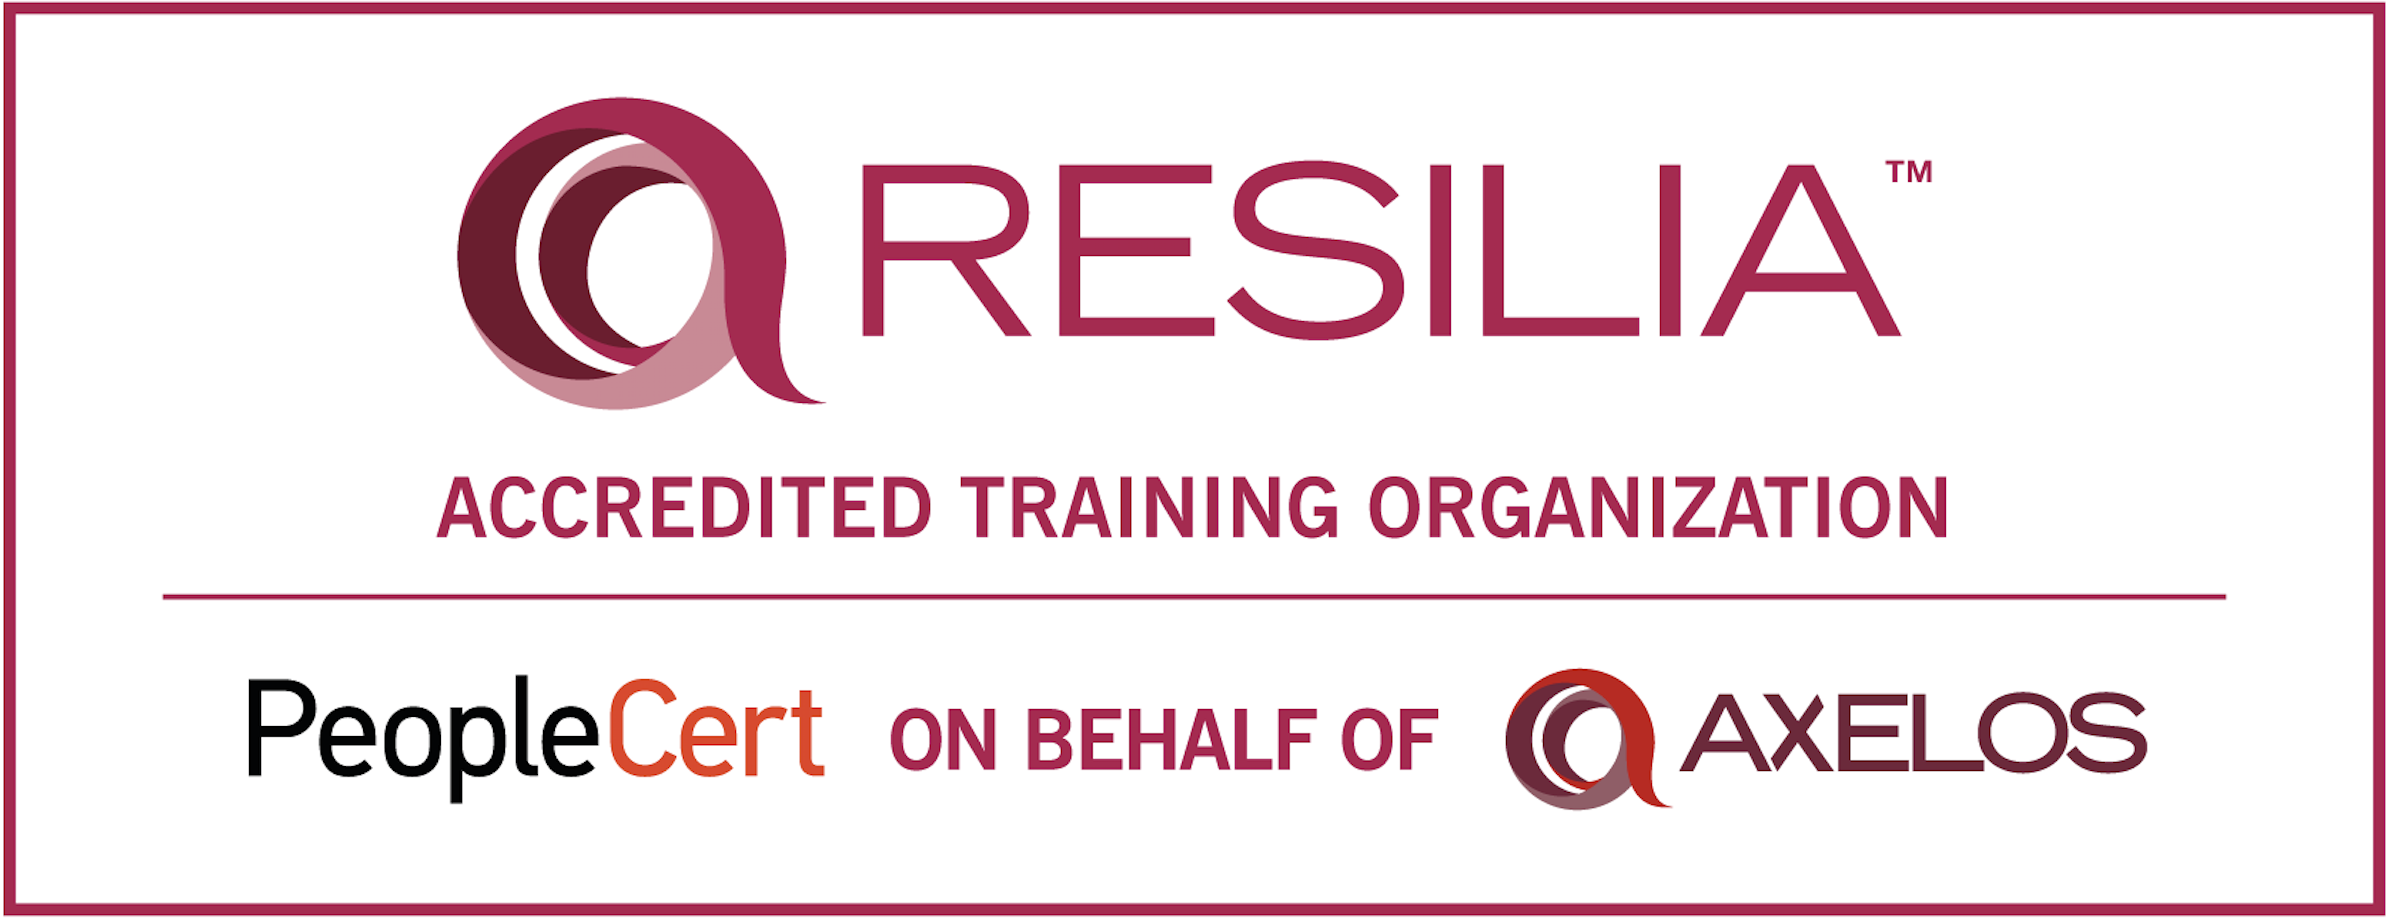 Corso RESILIA™ Foundation